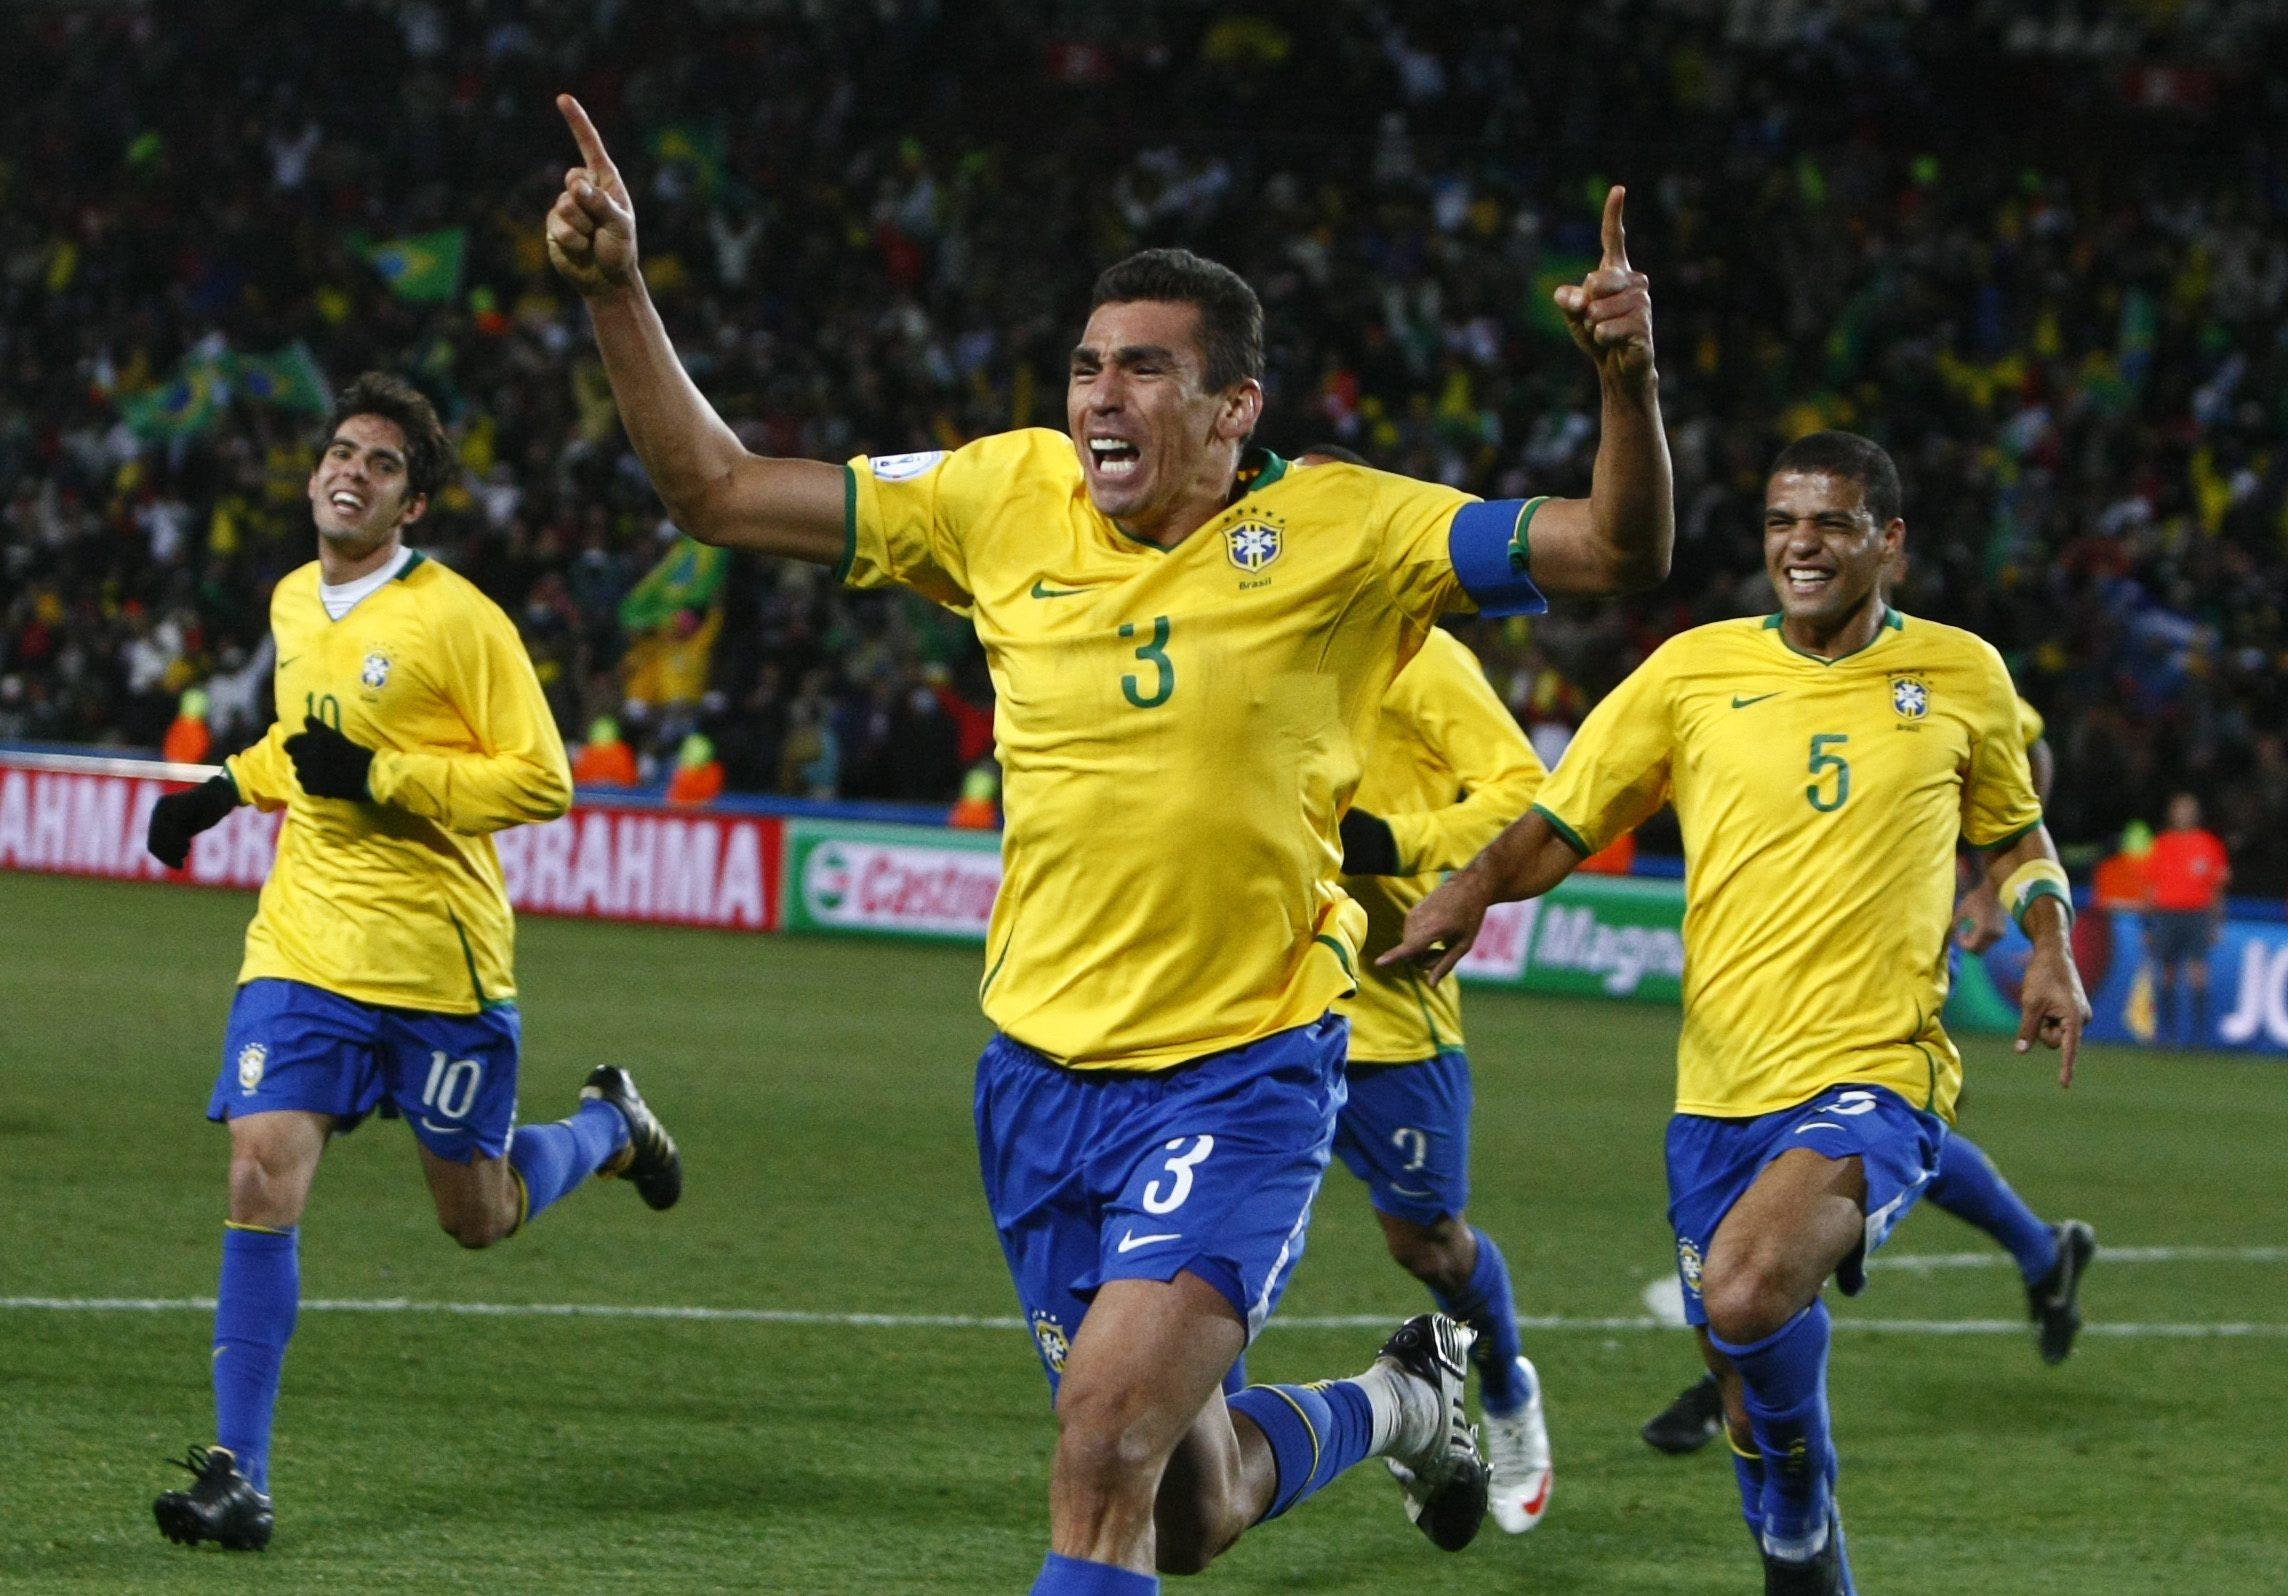 Brazil Football Team Players